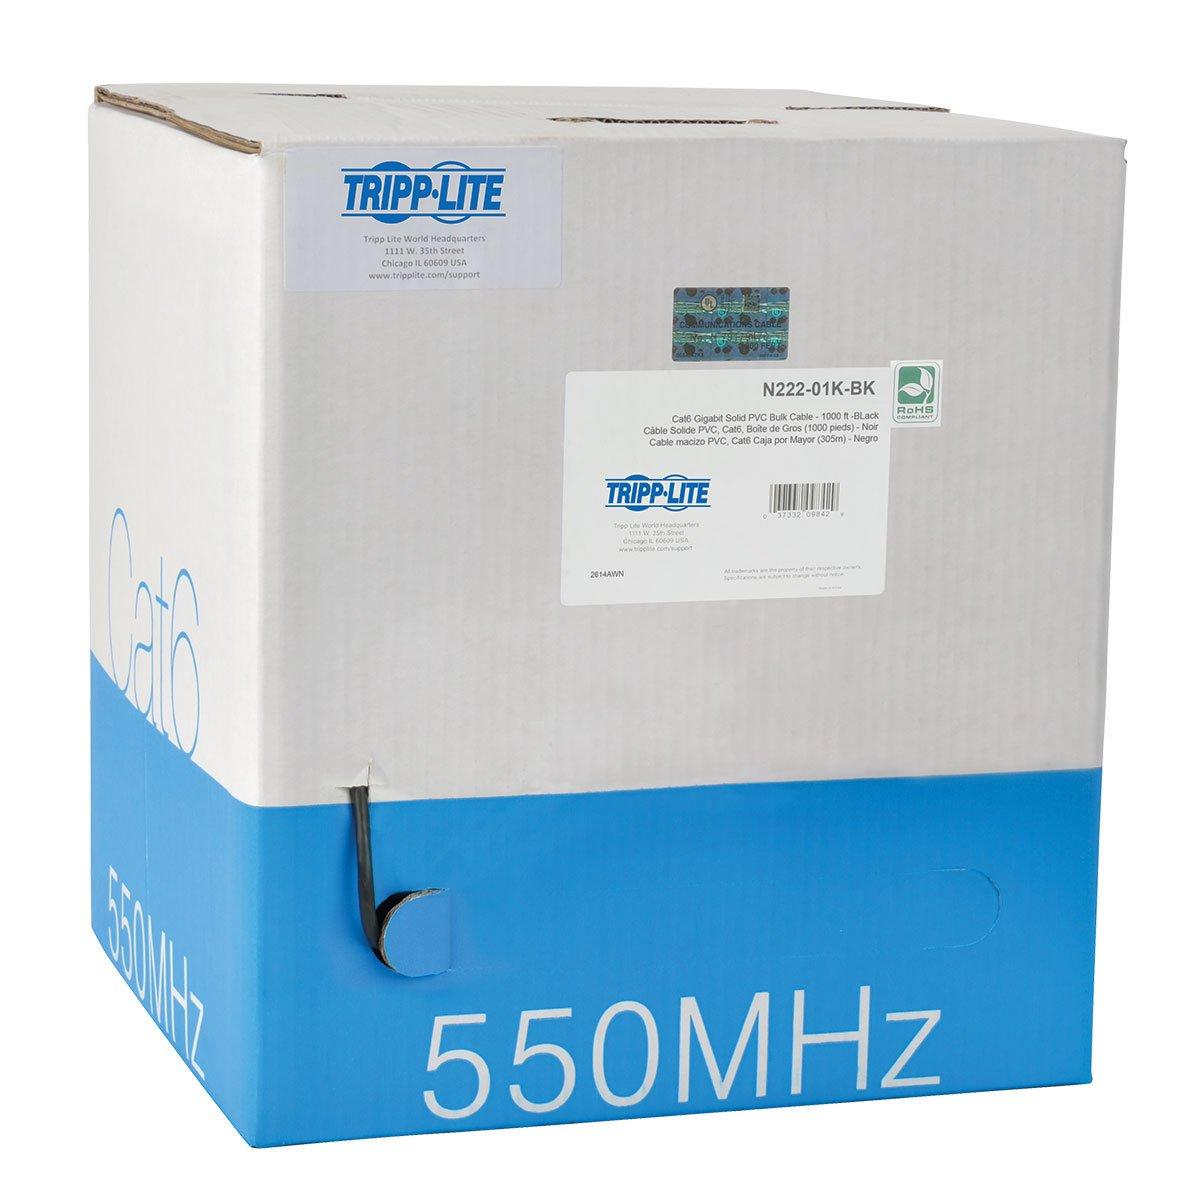 TRIPP LITE Cat6 Bulk Solid-Core Cable, CMR-Rated PVC, Gigabit, Black, 1000' (N222-01K-BK)